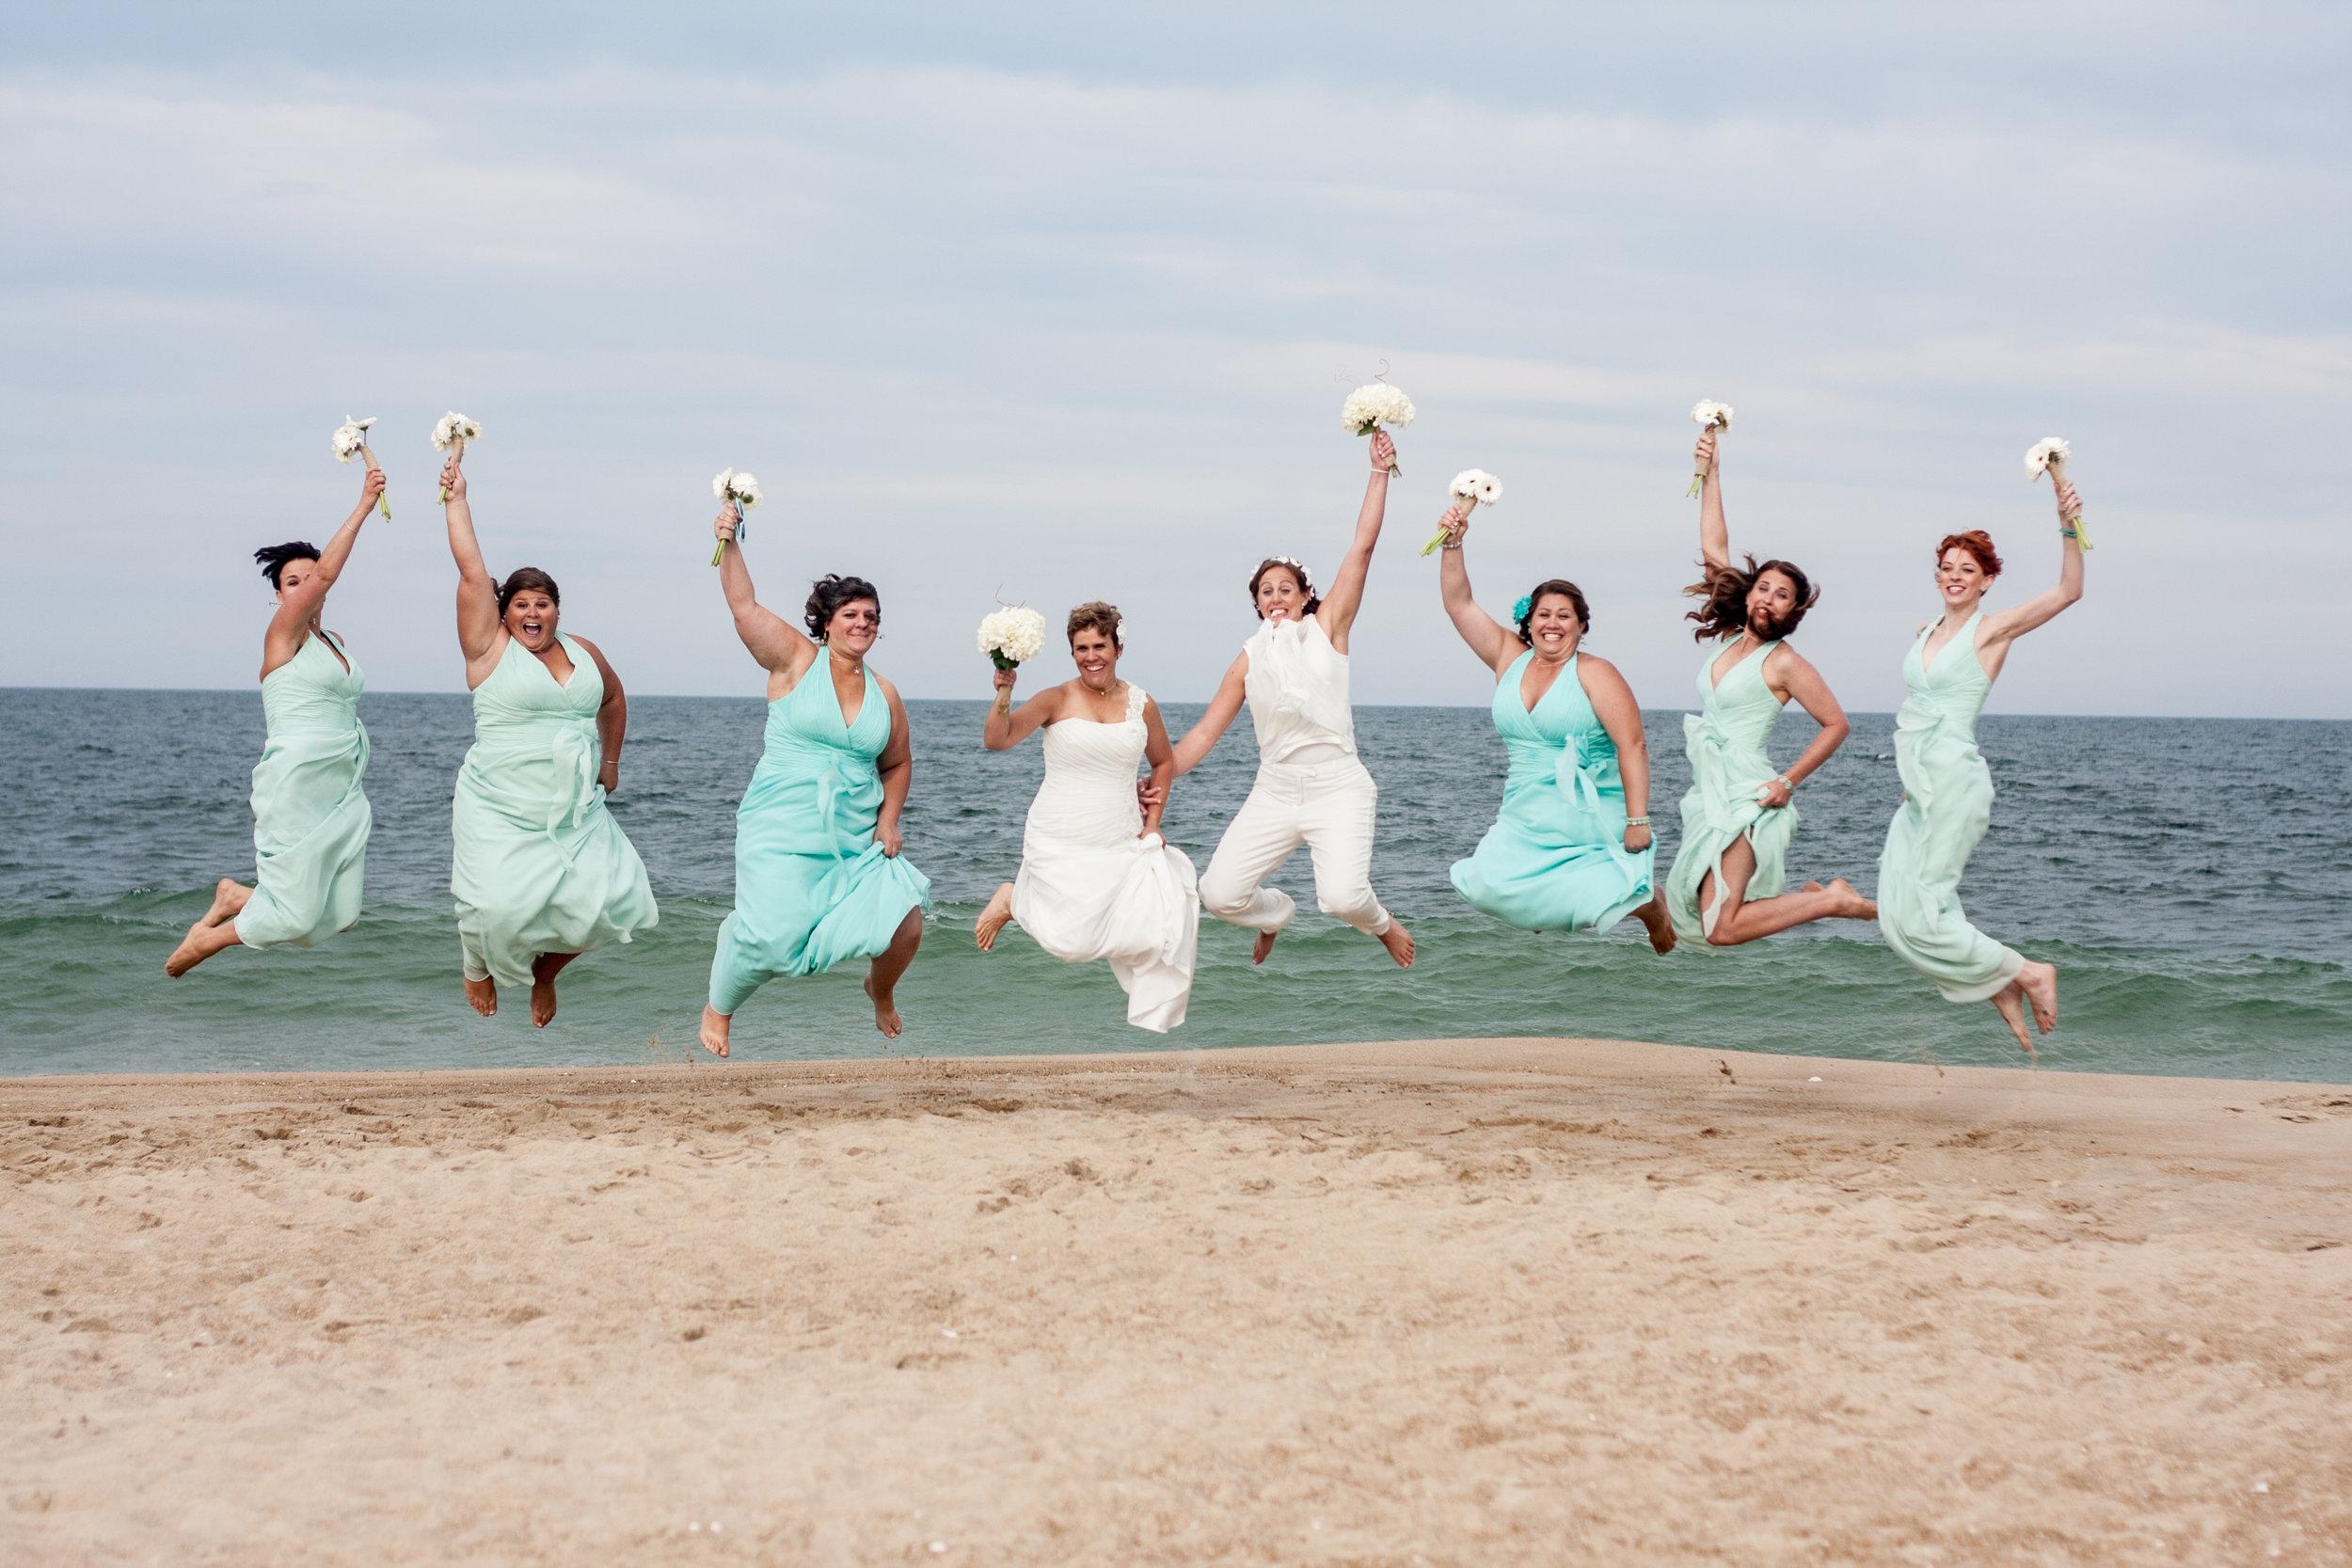 6-8-14_Errol Ebanks_Kelly and Tina Wedding_1417.jpg